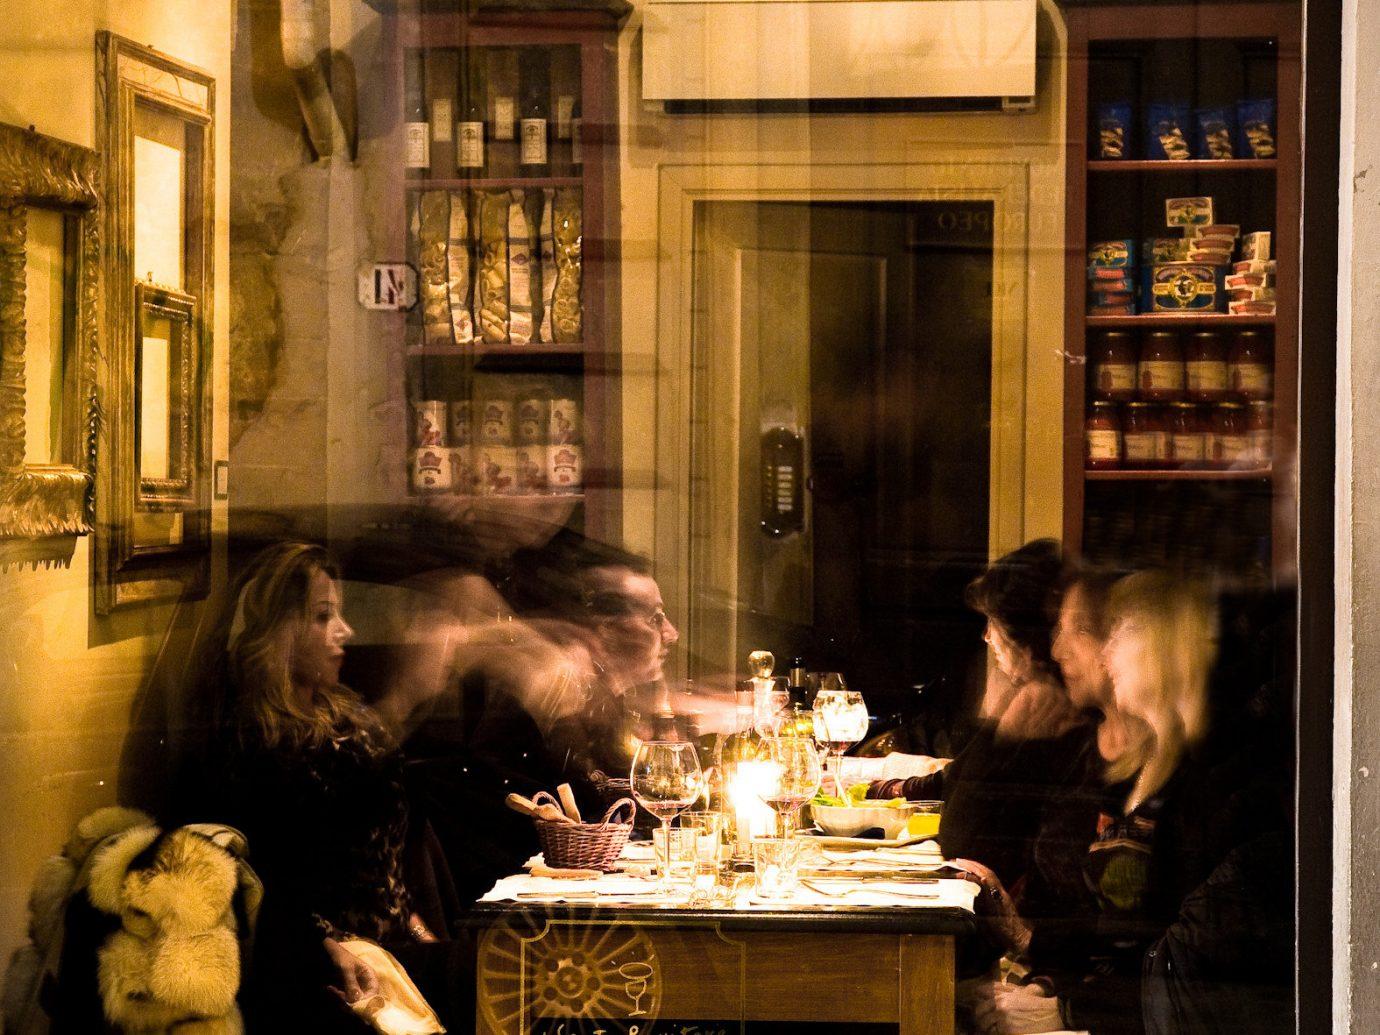 Food + Drink display window building interior design lighting Fireplace Bar tourist attraction restaurant stone